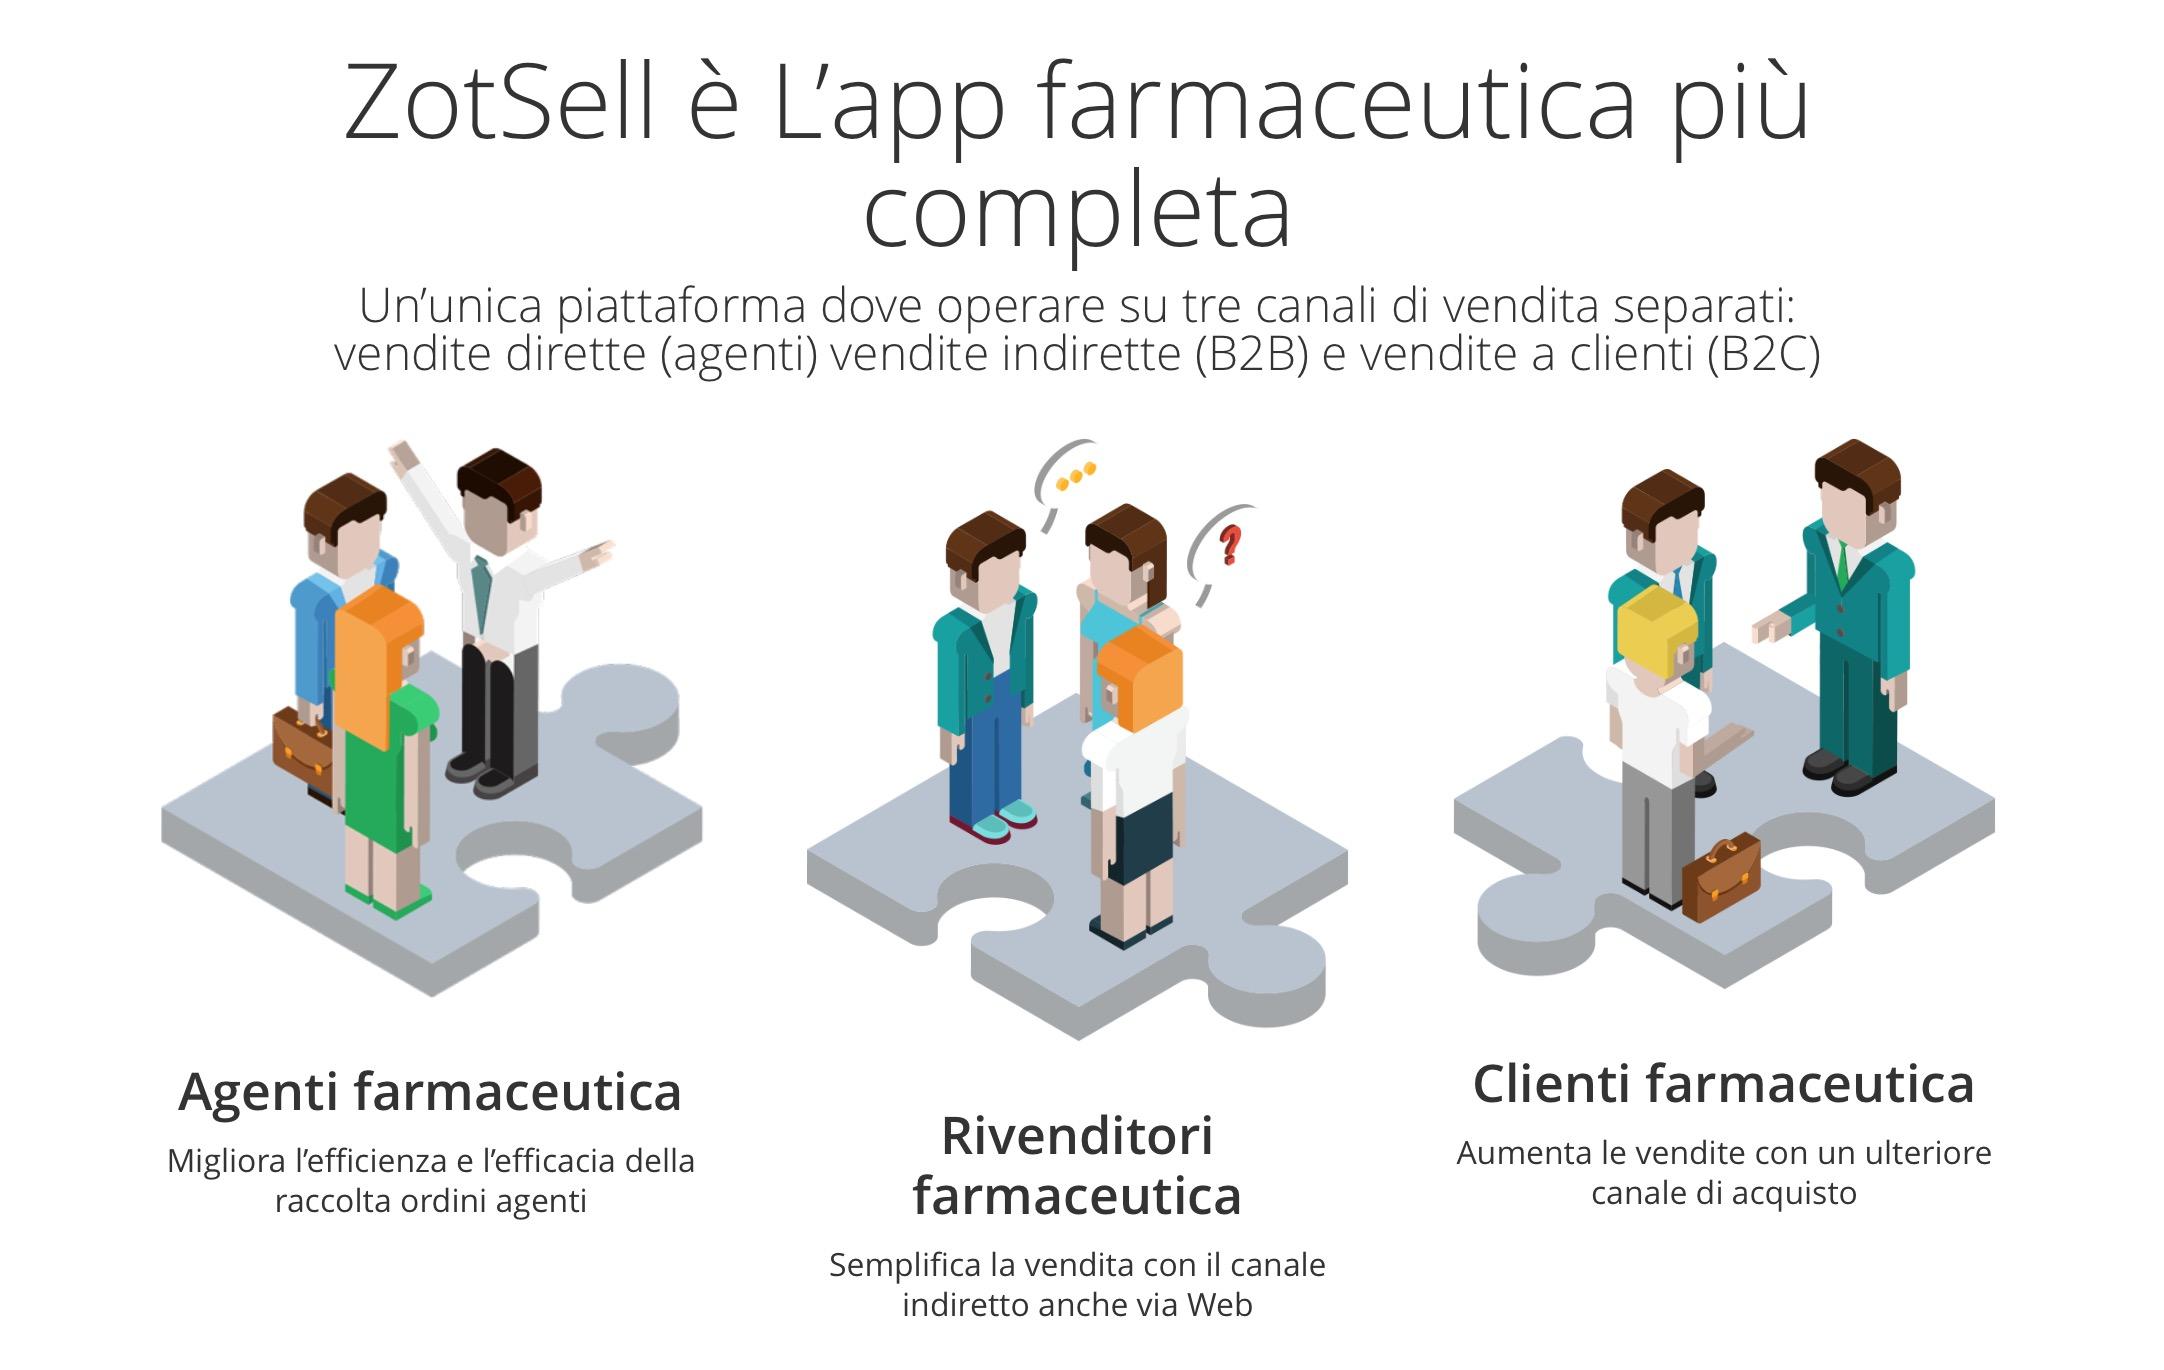 ZotSell Farmaceutica